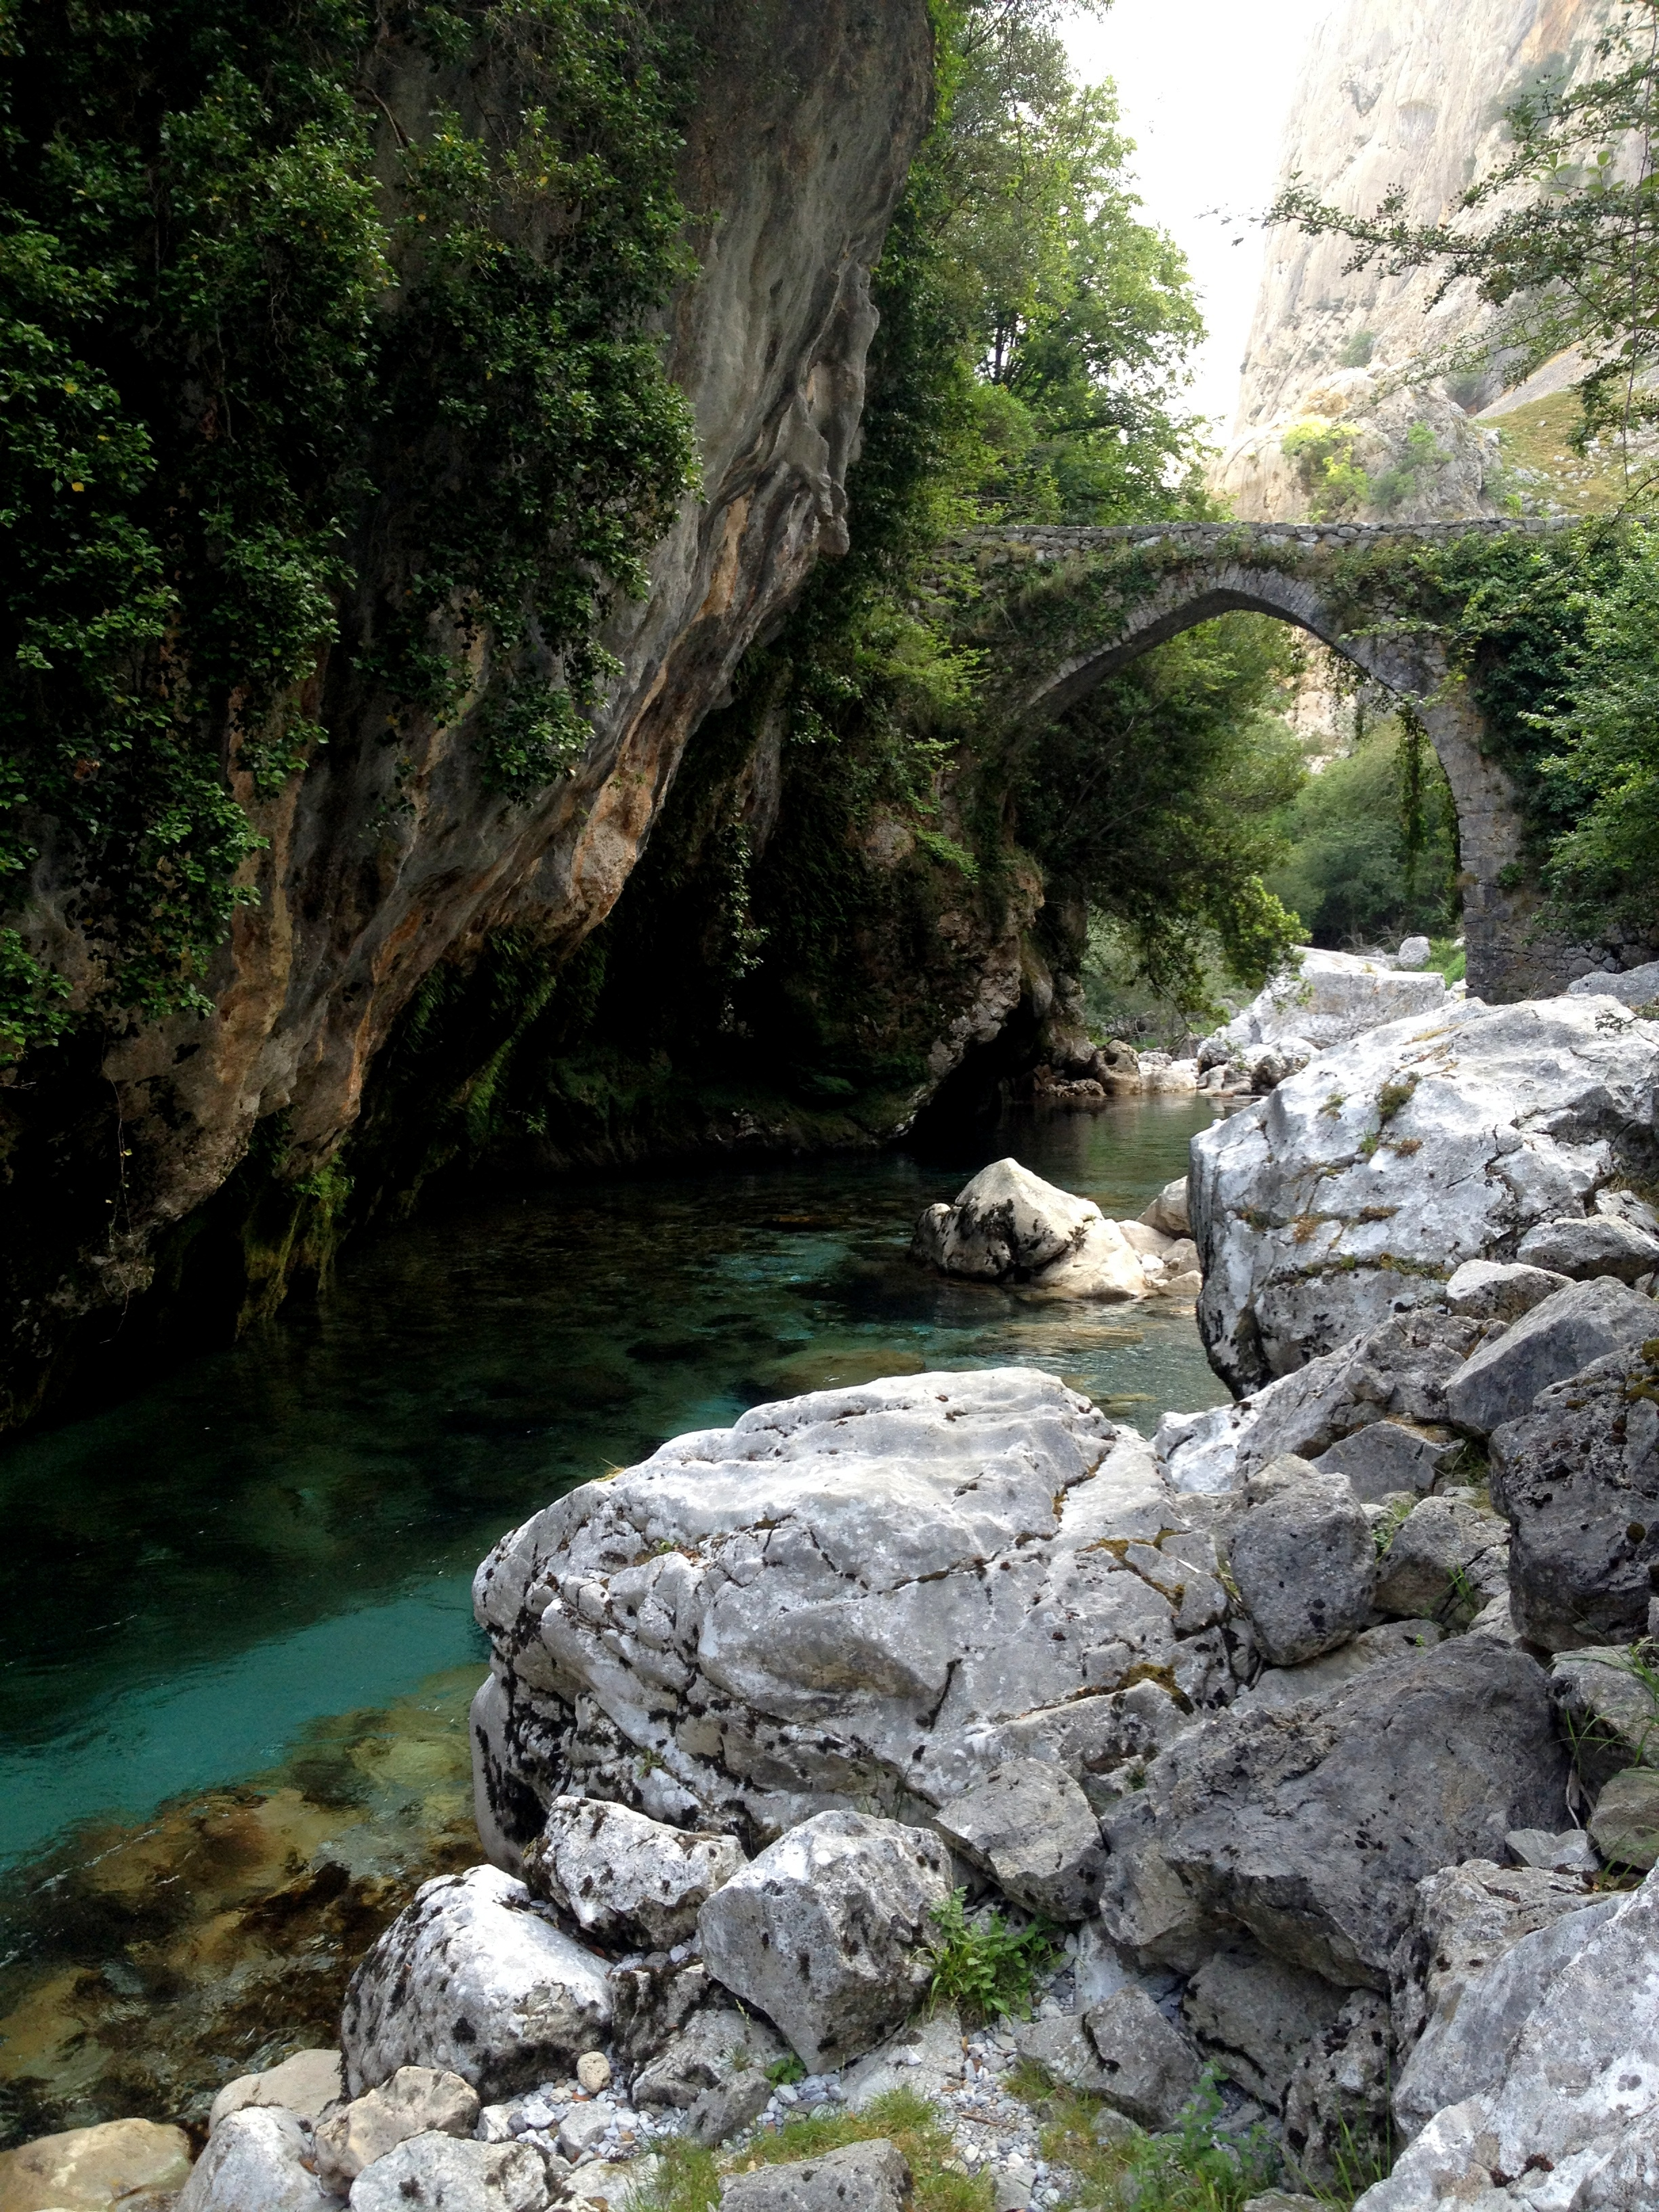 Little Bridge, Spain